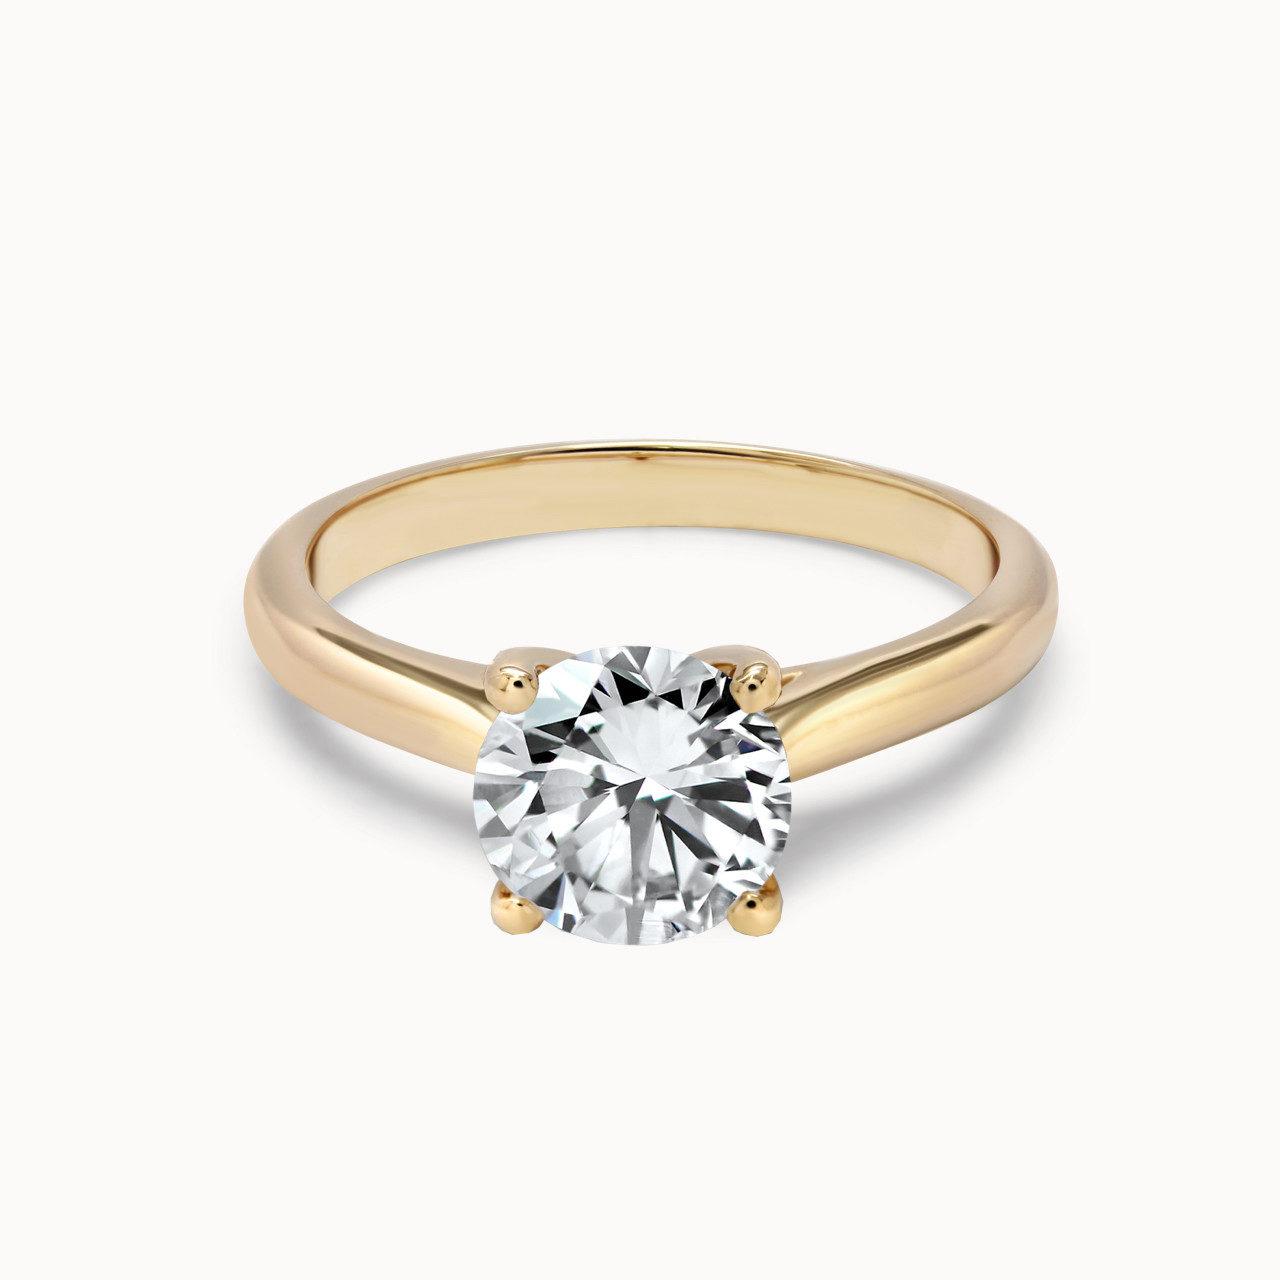 4 Krappen Roségold Verlobungsring mit 1,25ct Diamant